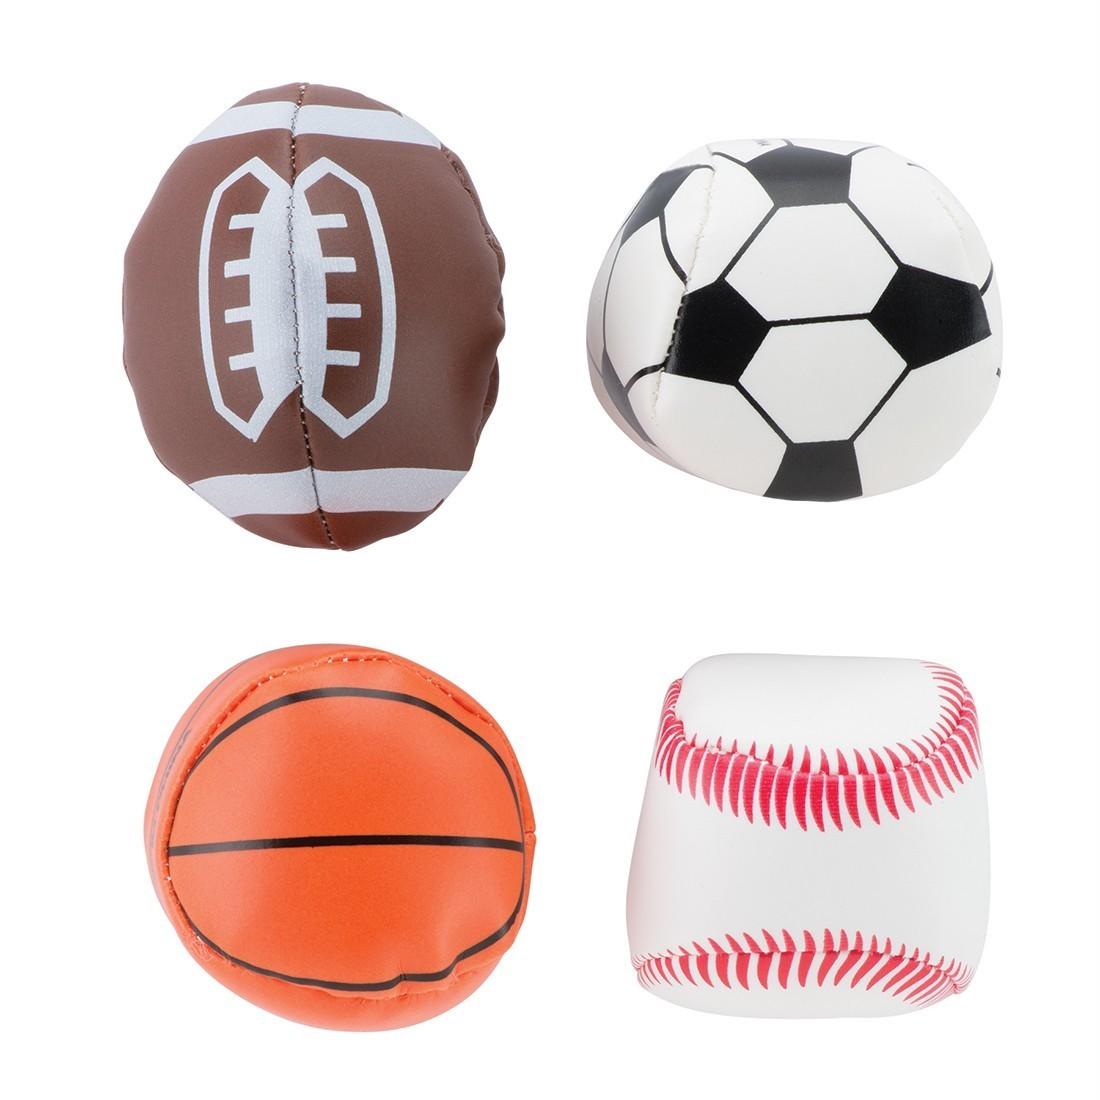 Soft Foam-Filled Sports Balls [image]